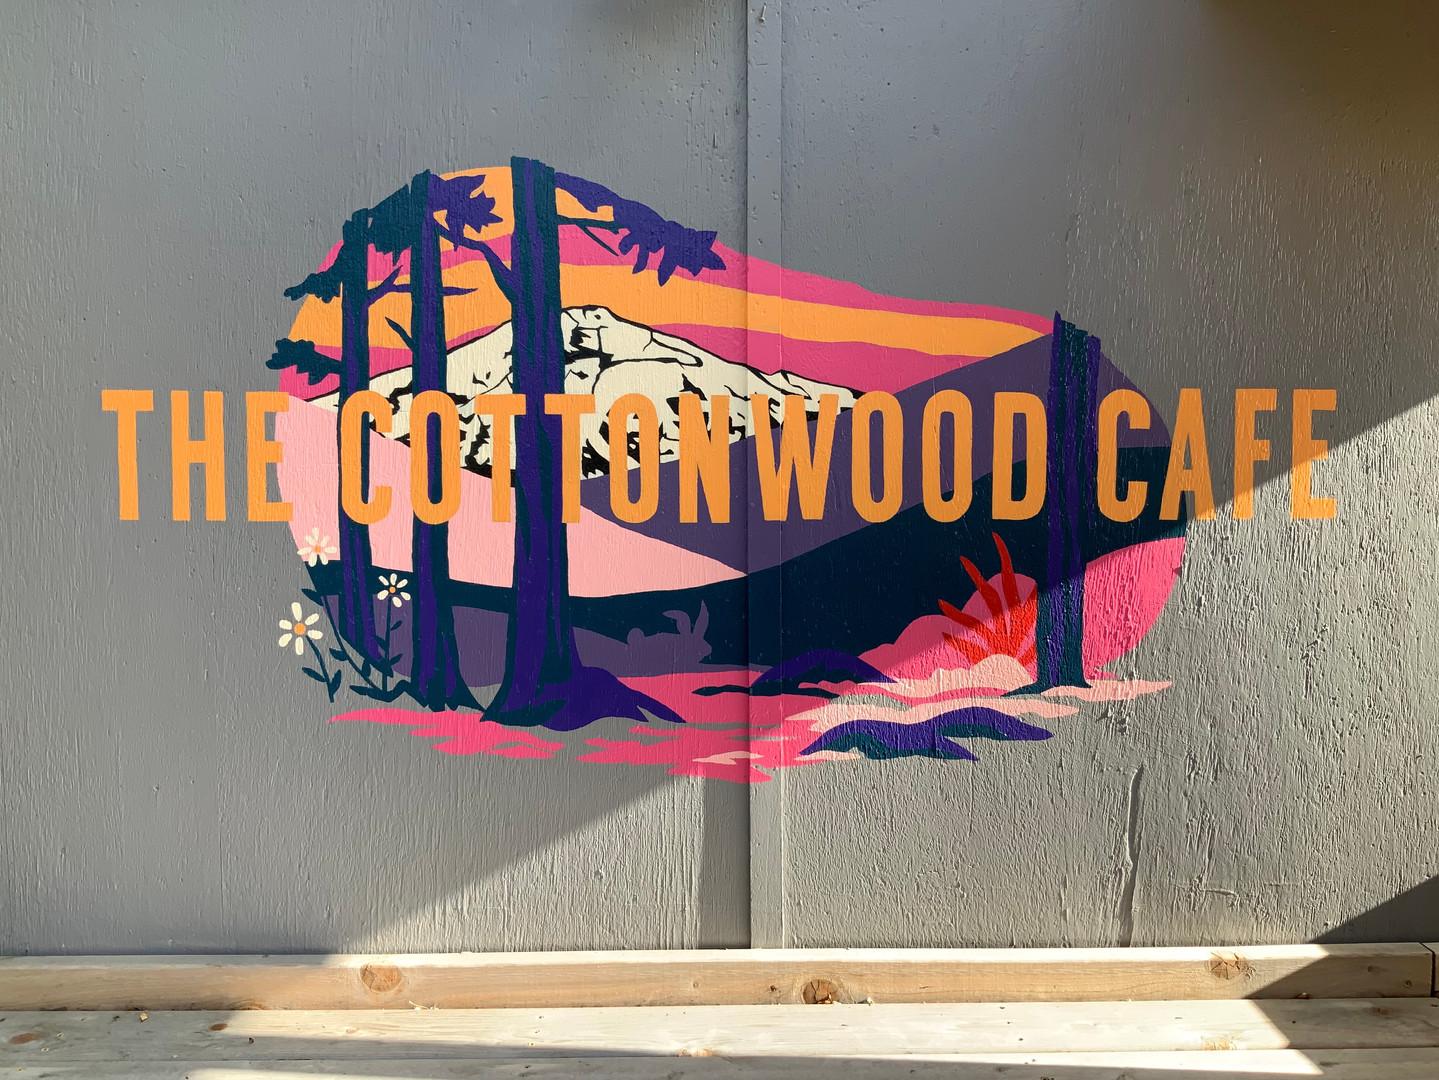 Cottonwood Cafe Patio Sign.JPG